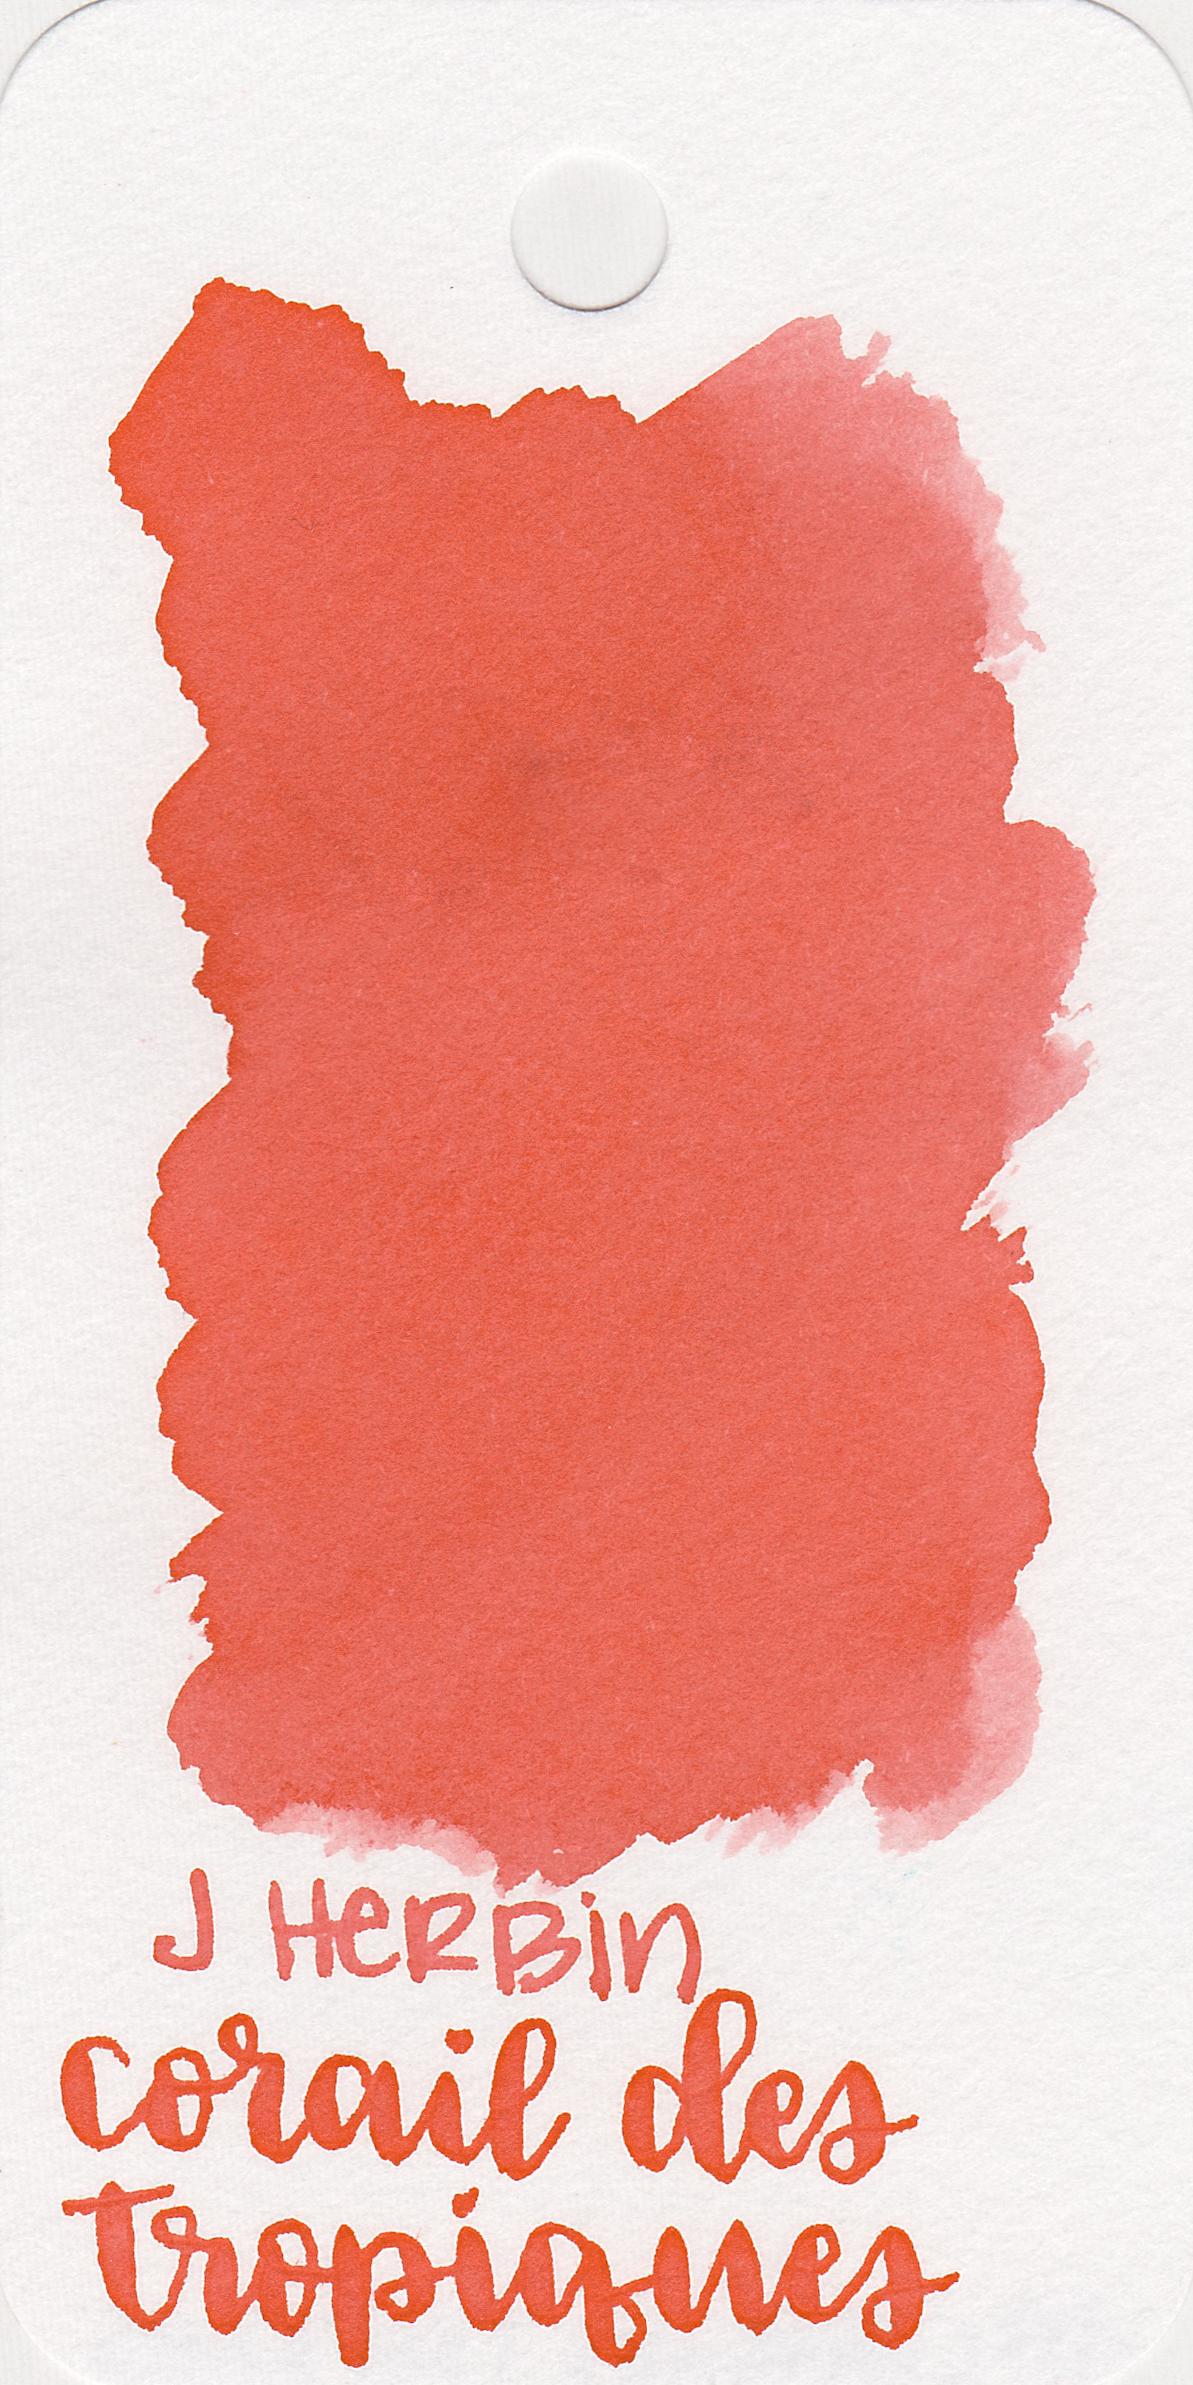 jh-corail-des-tropiques-1.jpg